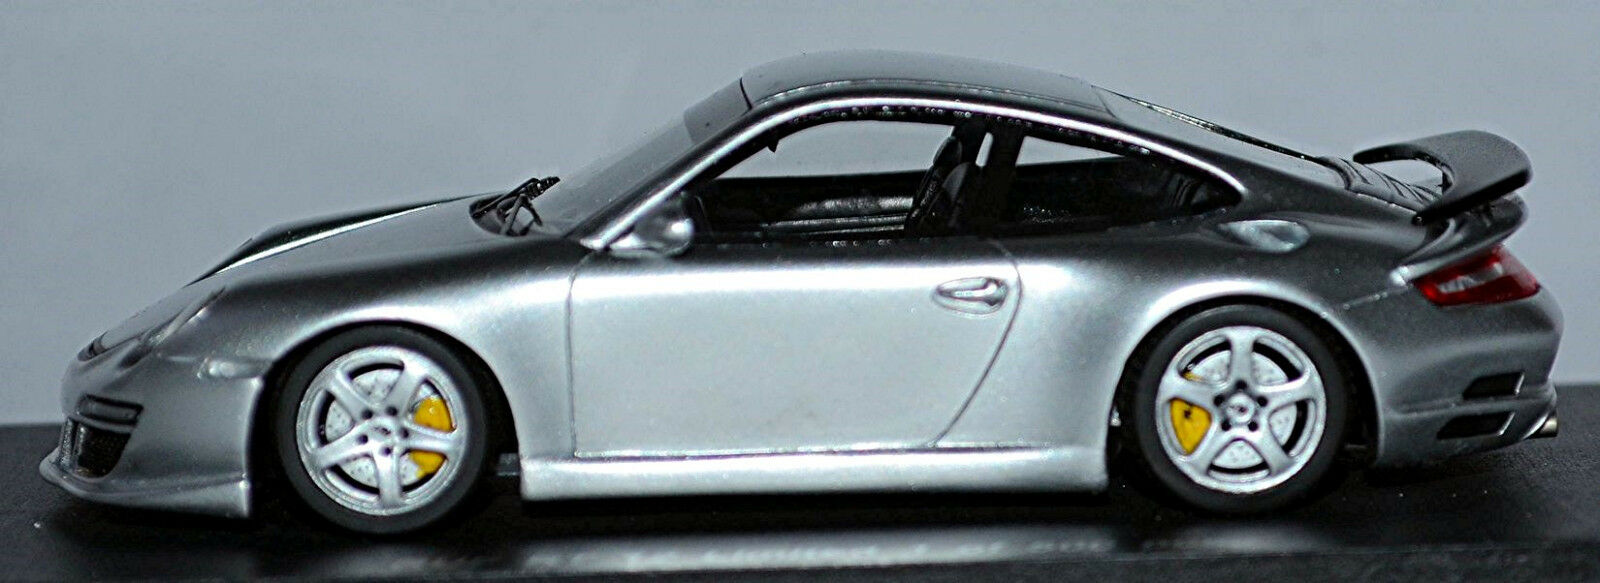 Ruf RT RT RT 12 Porsche 911 Coupé 2006 argent argent métallique 1 43 Spark 086f3e